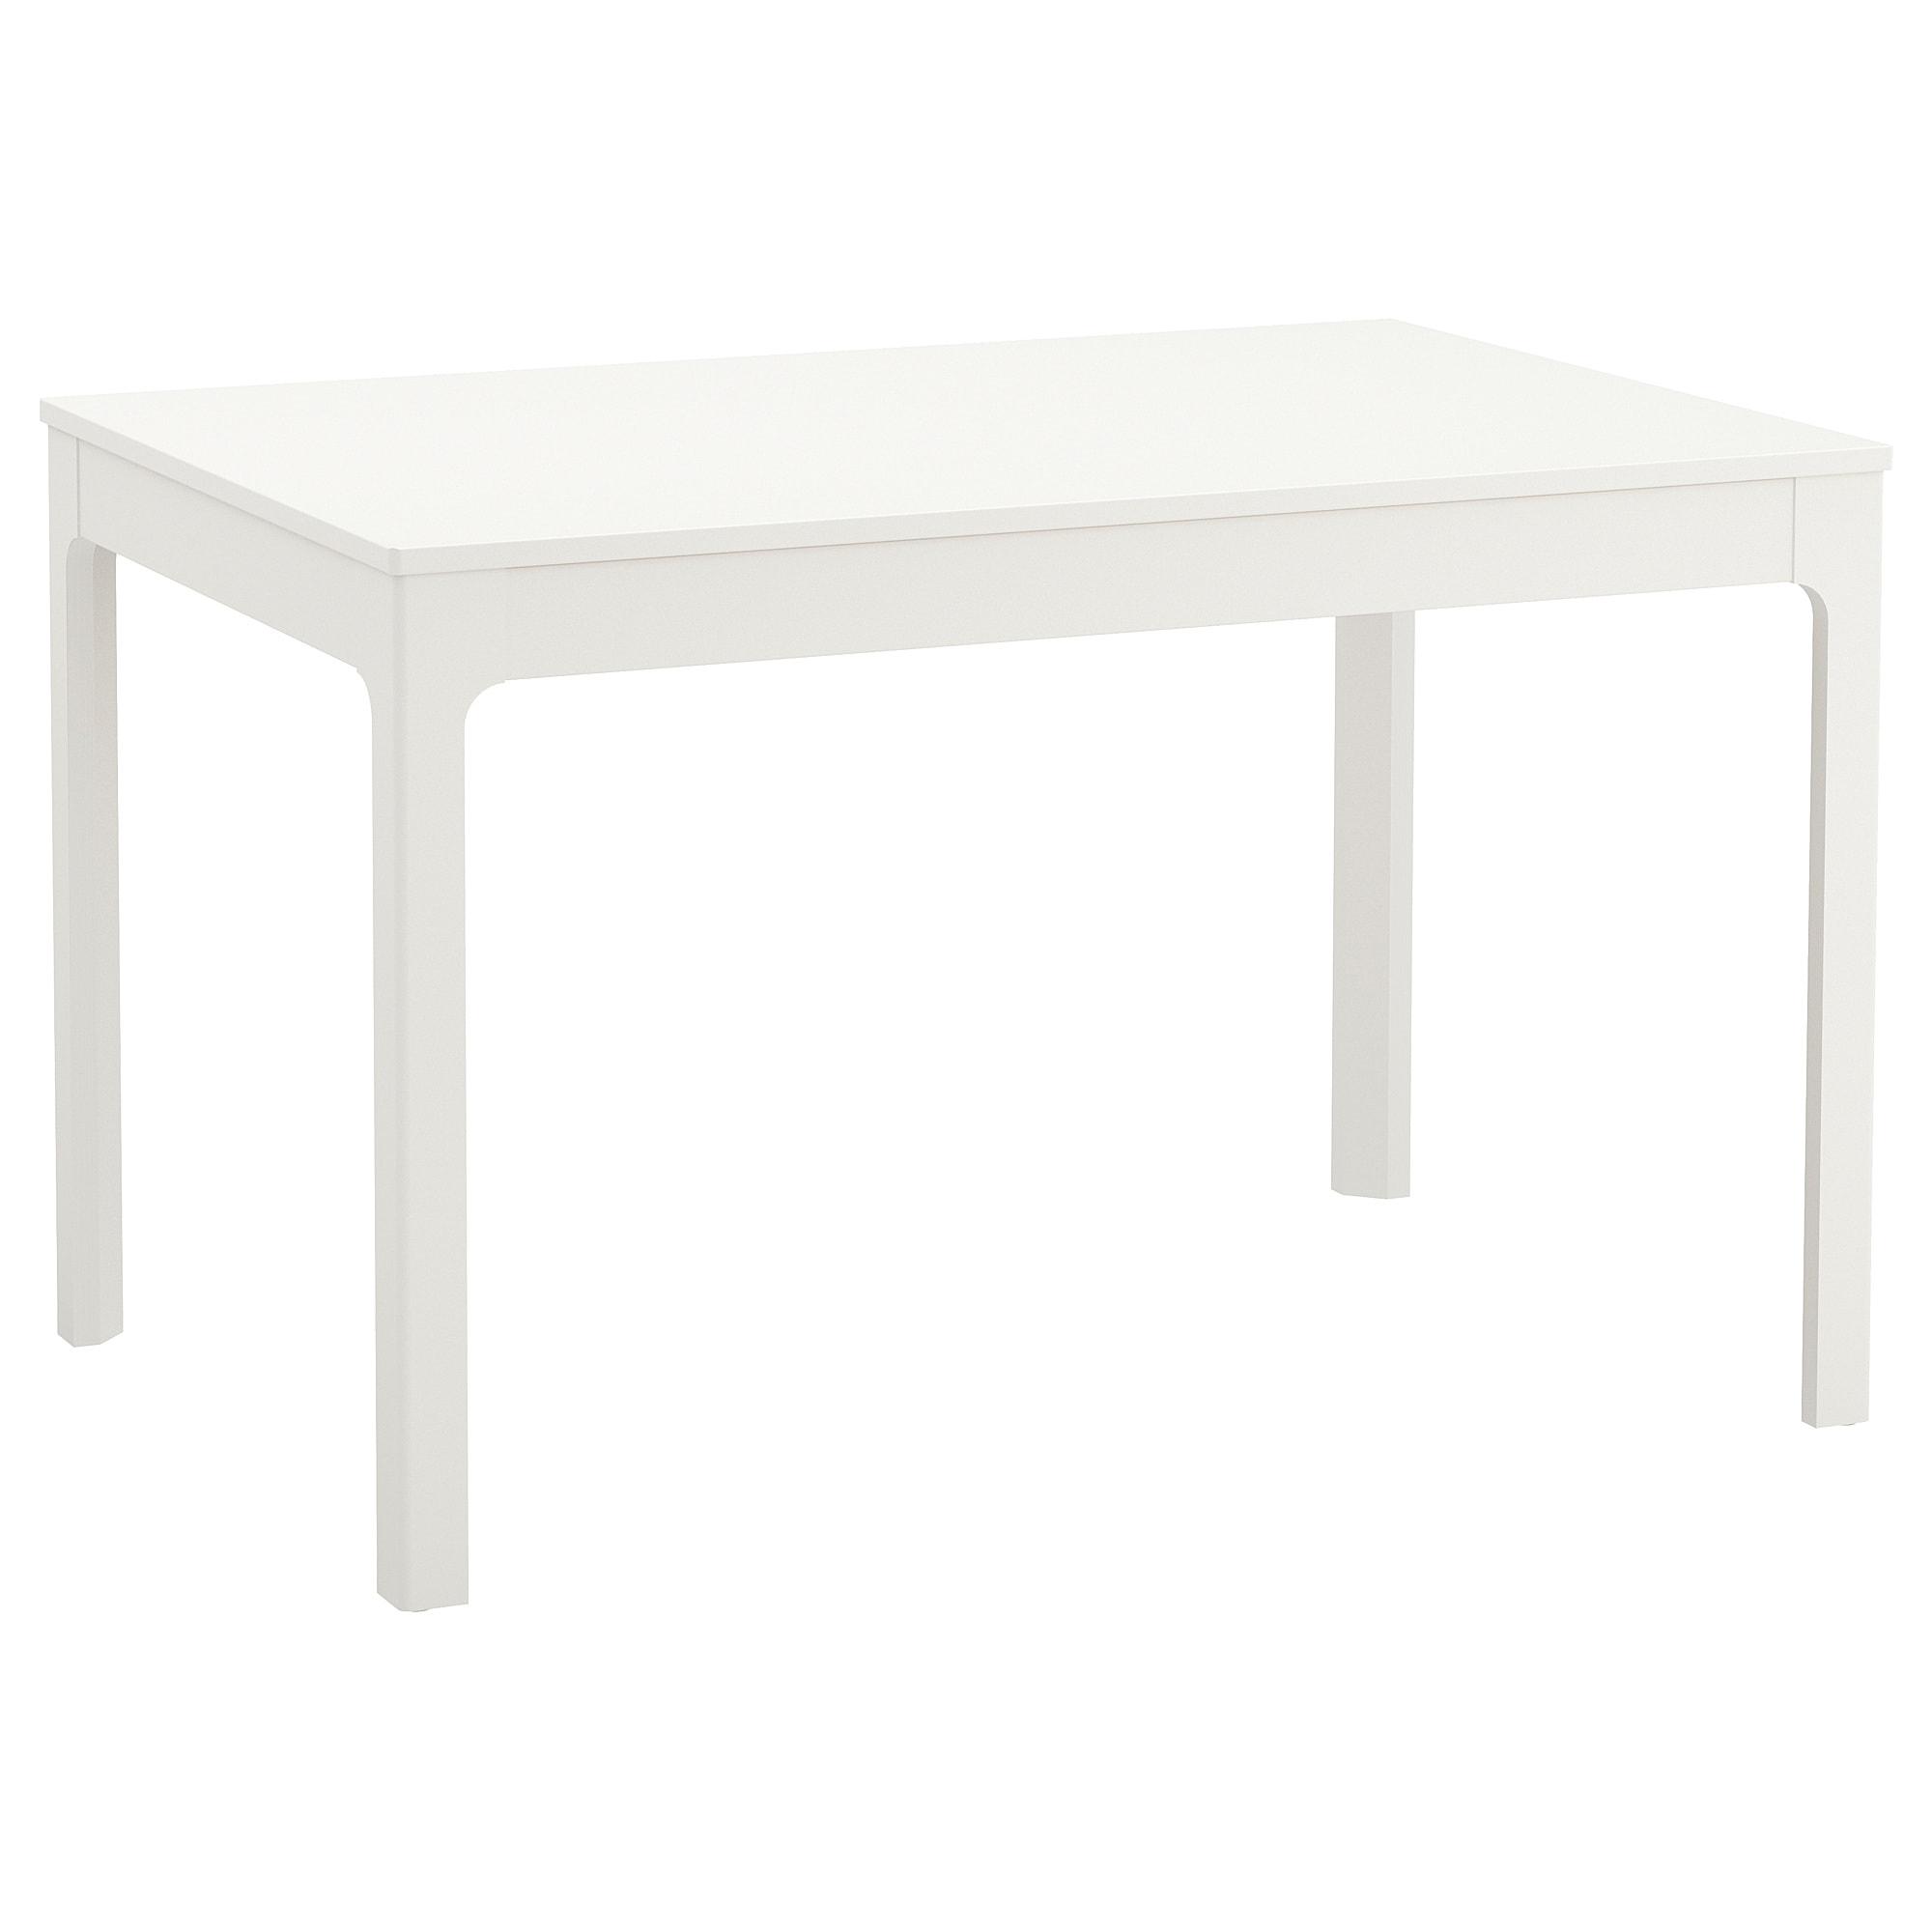 Mesa Comedor Extensible Ikea Nkde Ekedalen Mesa Extensible Blanco 120 180 X 80 Cm Ikea